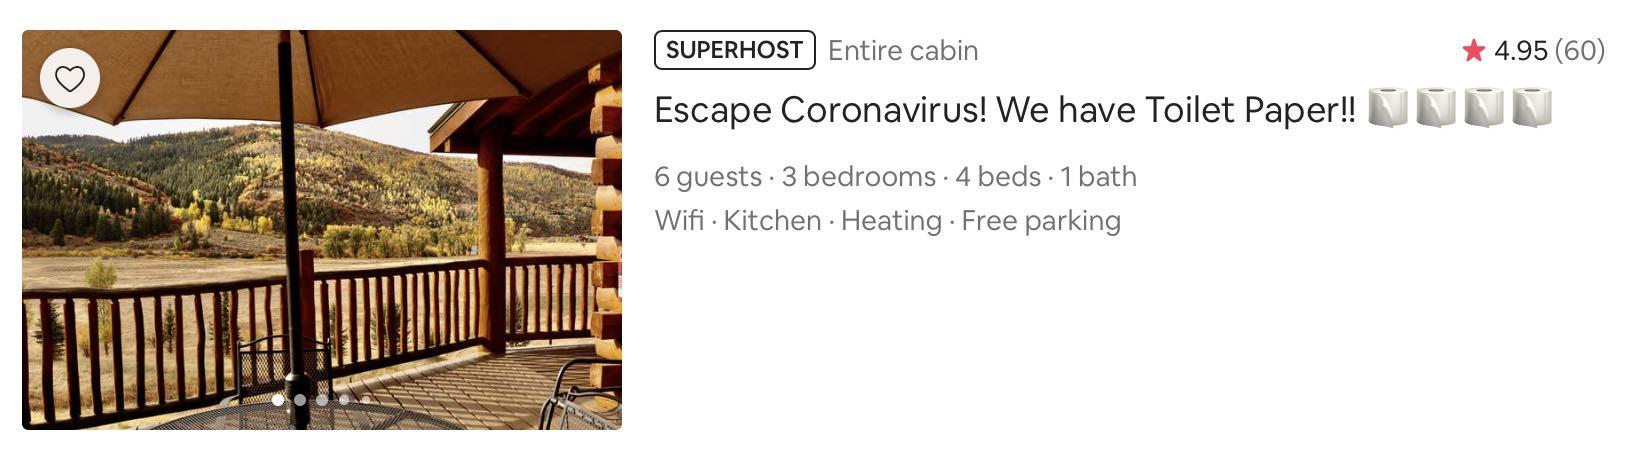 Coronavirus airbnb title example